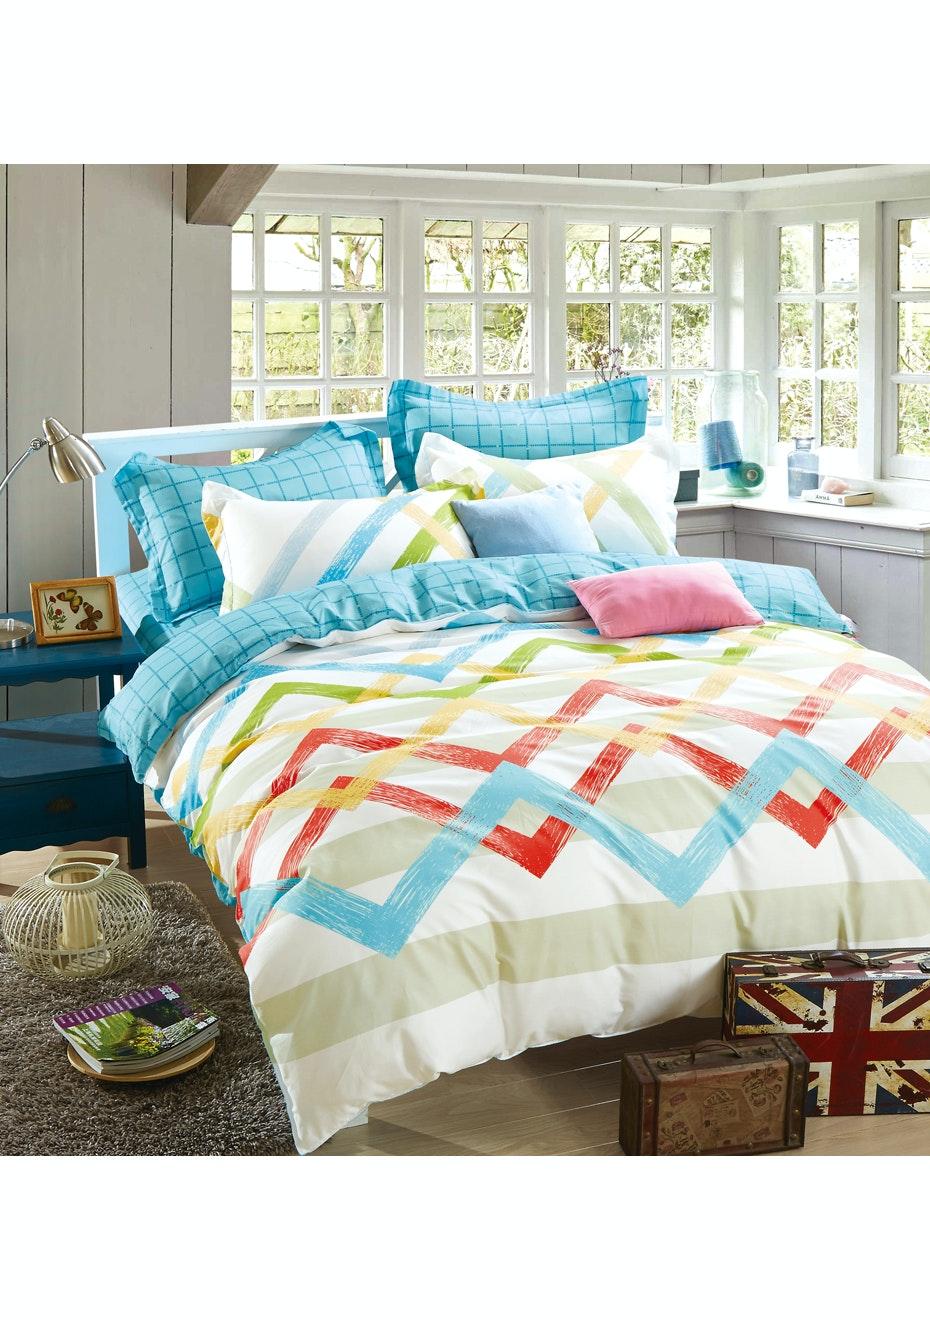 Skylar Quilt Cover Set - Reversible Design - 100% Cotton Single Bed